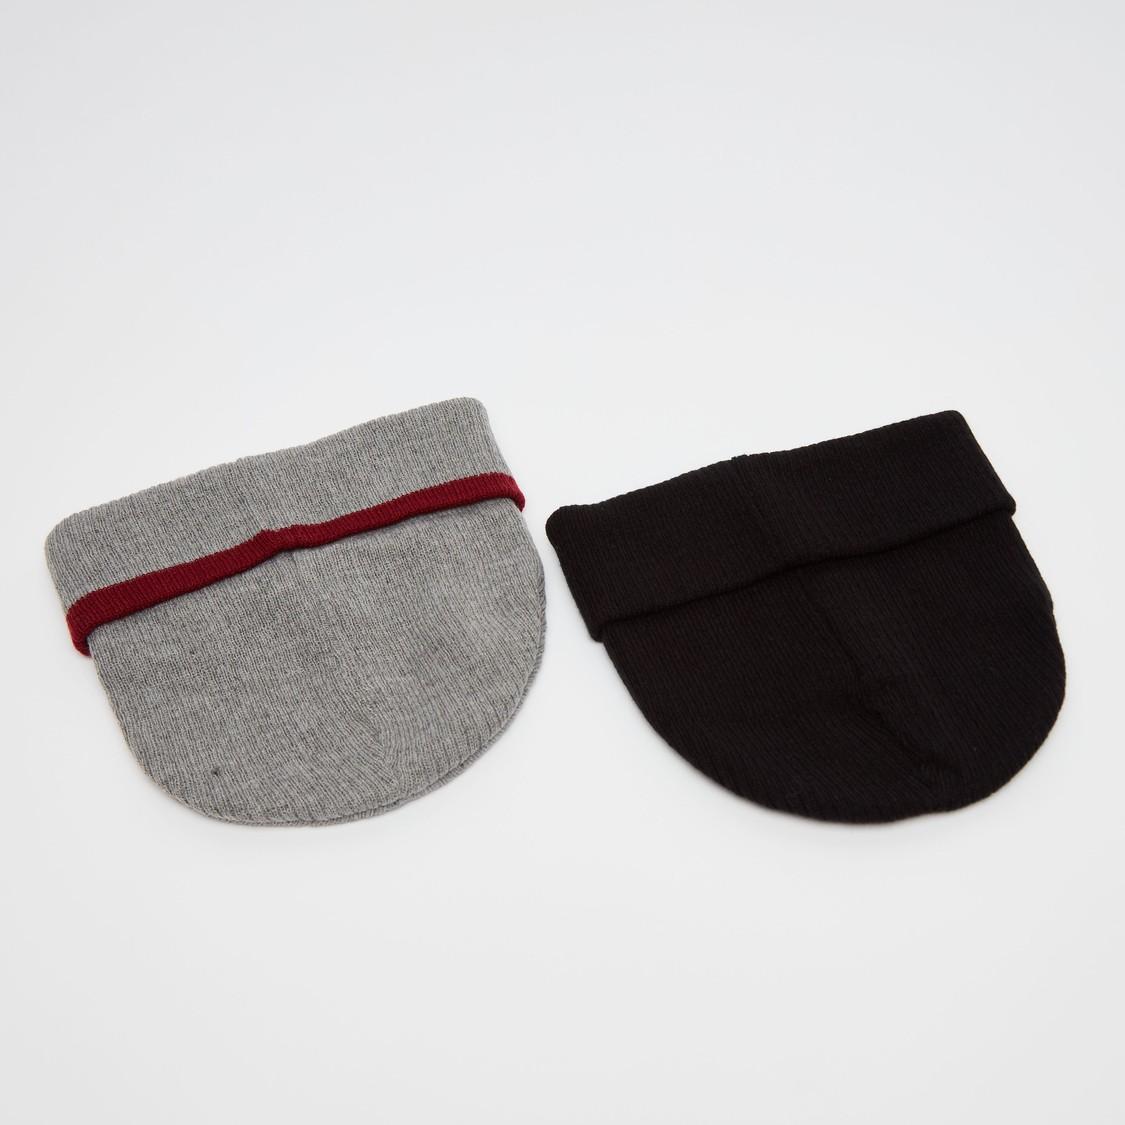 Set of 2 - Beanie Caps with Applique